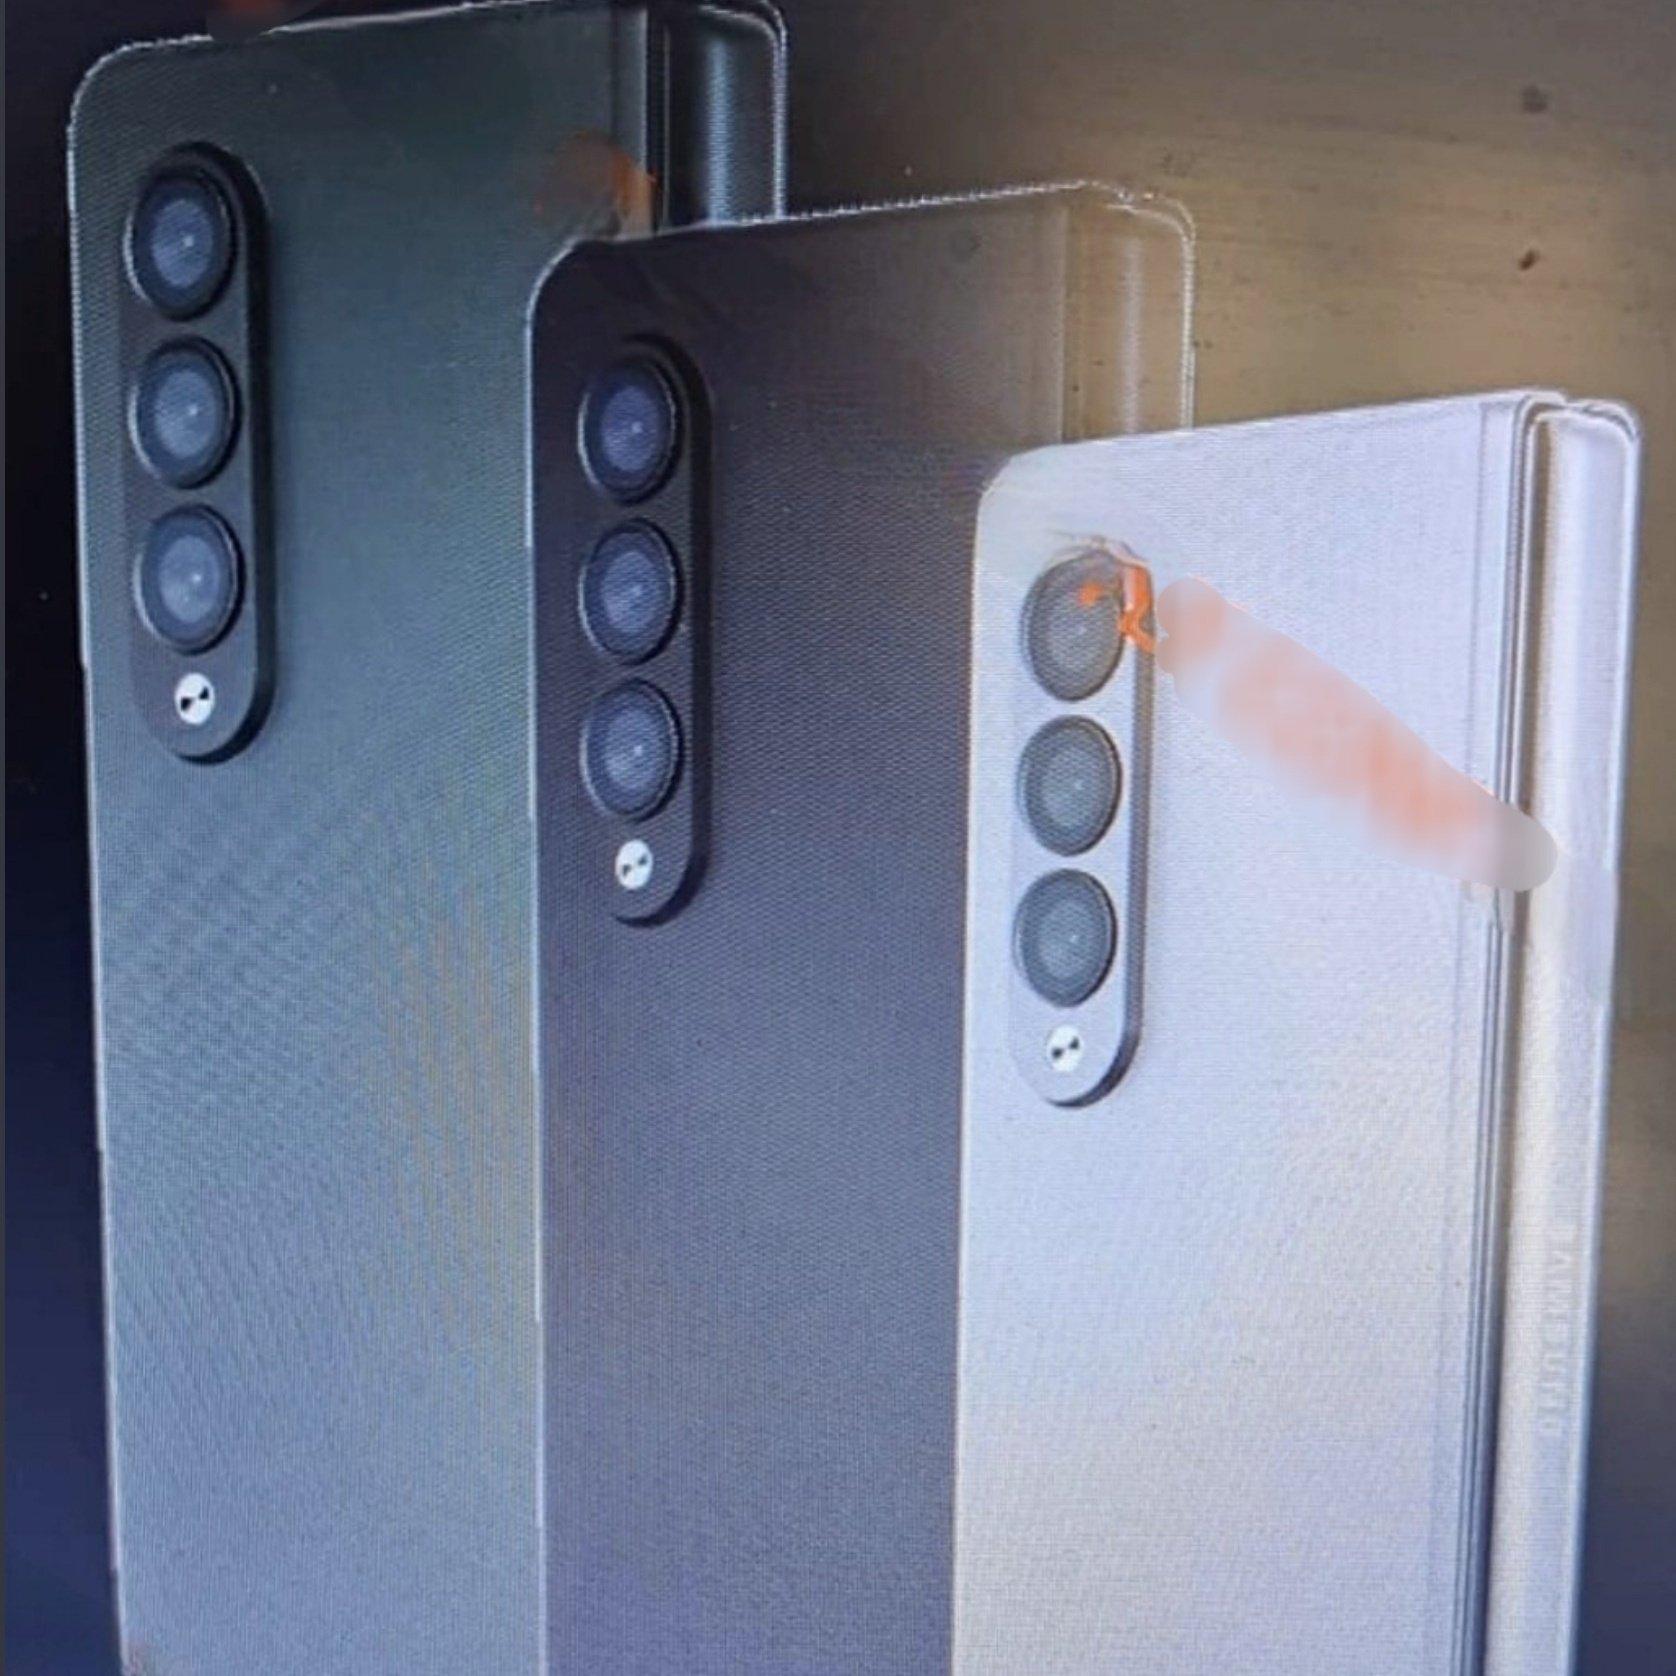 Samsung Galaxy Z Fold 3 leaked promo image 1